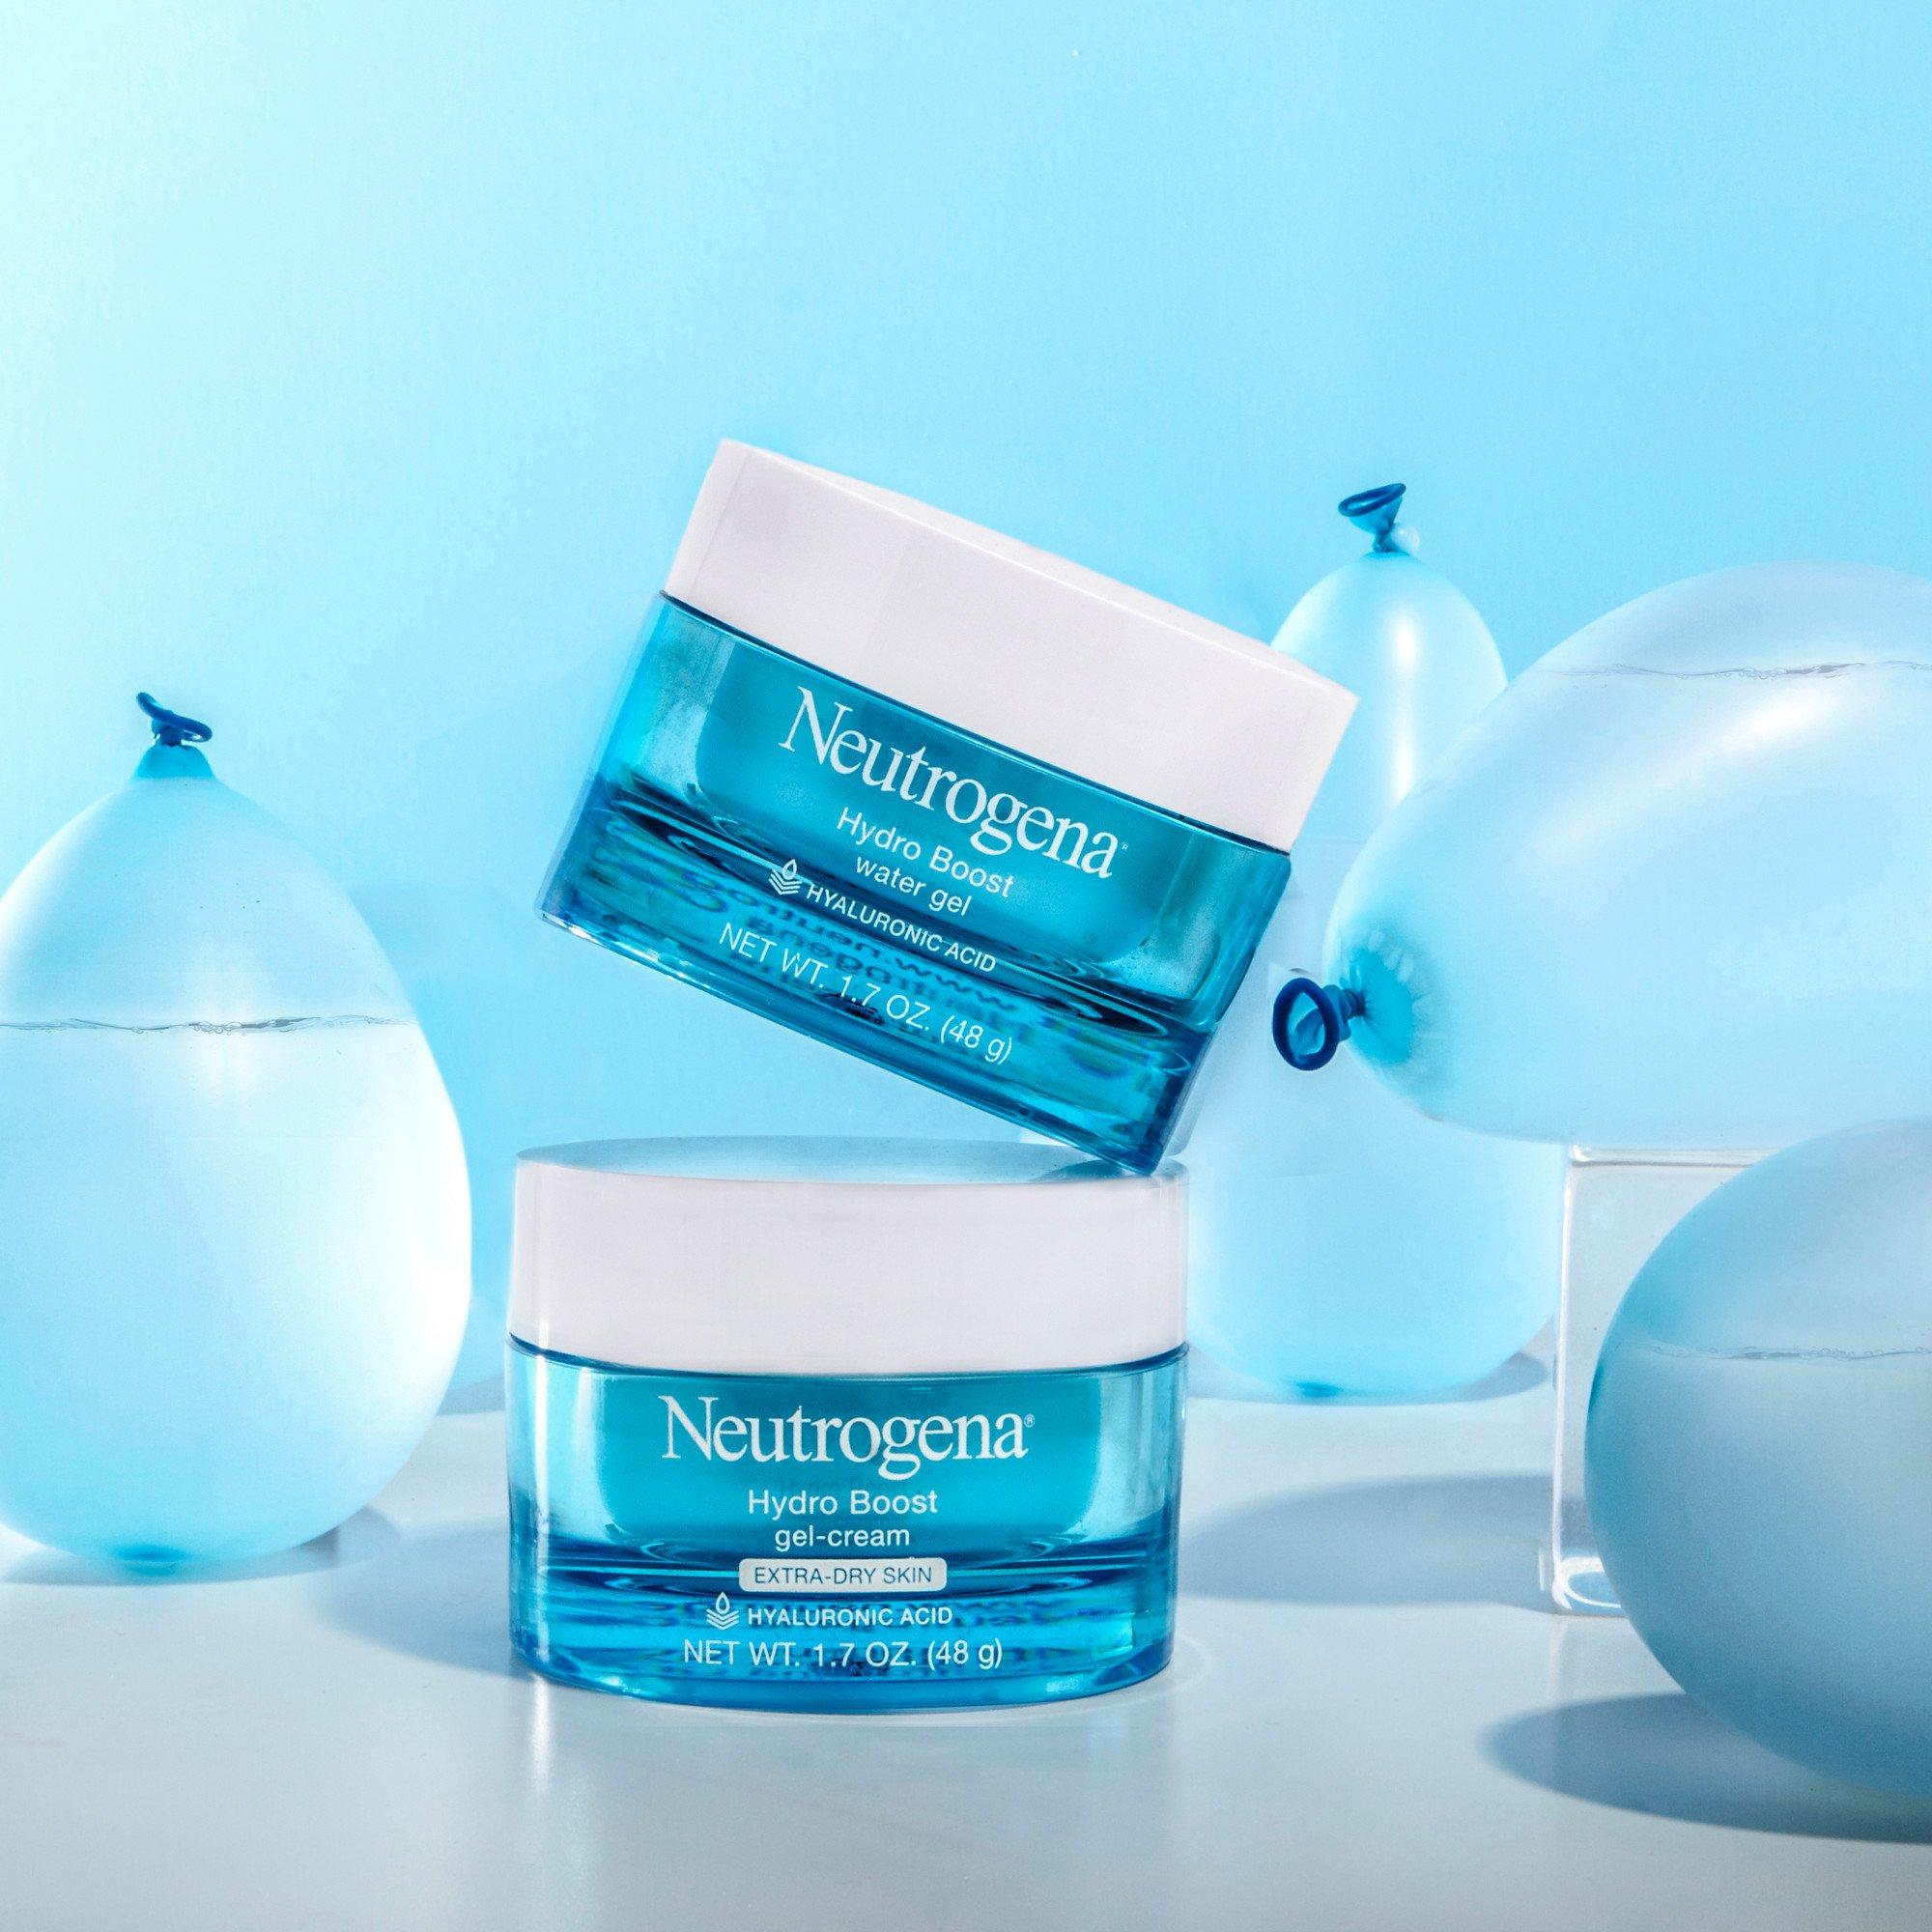 Neutrogena Hydro Boost Hyaluronic Acid Hydrating Face Moisturizer Gel-Cream to Hydrate and Smooth Extra-Dry Skin, 1.7 oz by Neutrogena (Image #5)